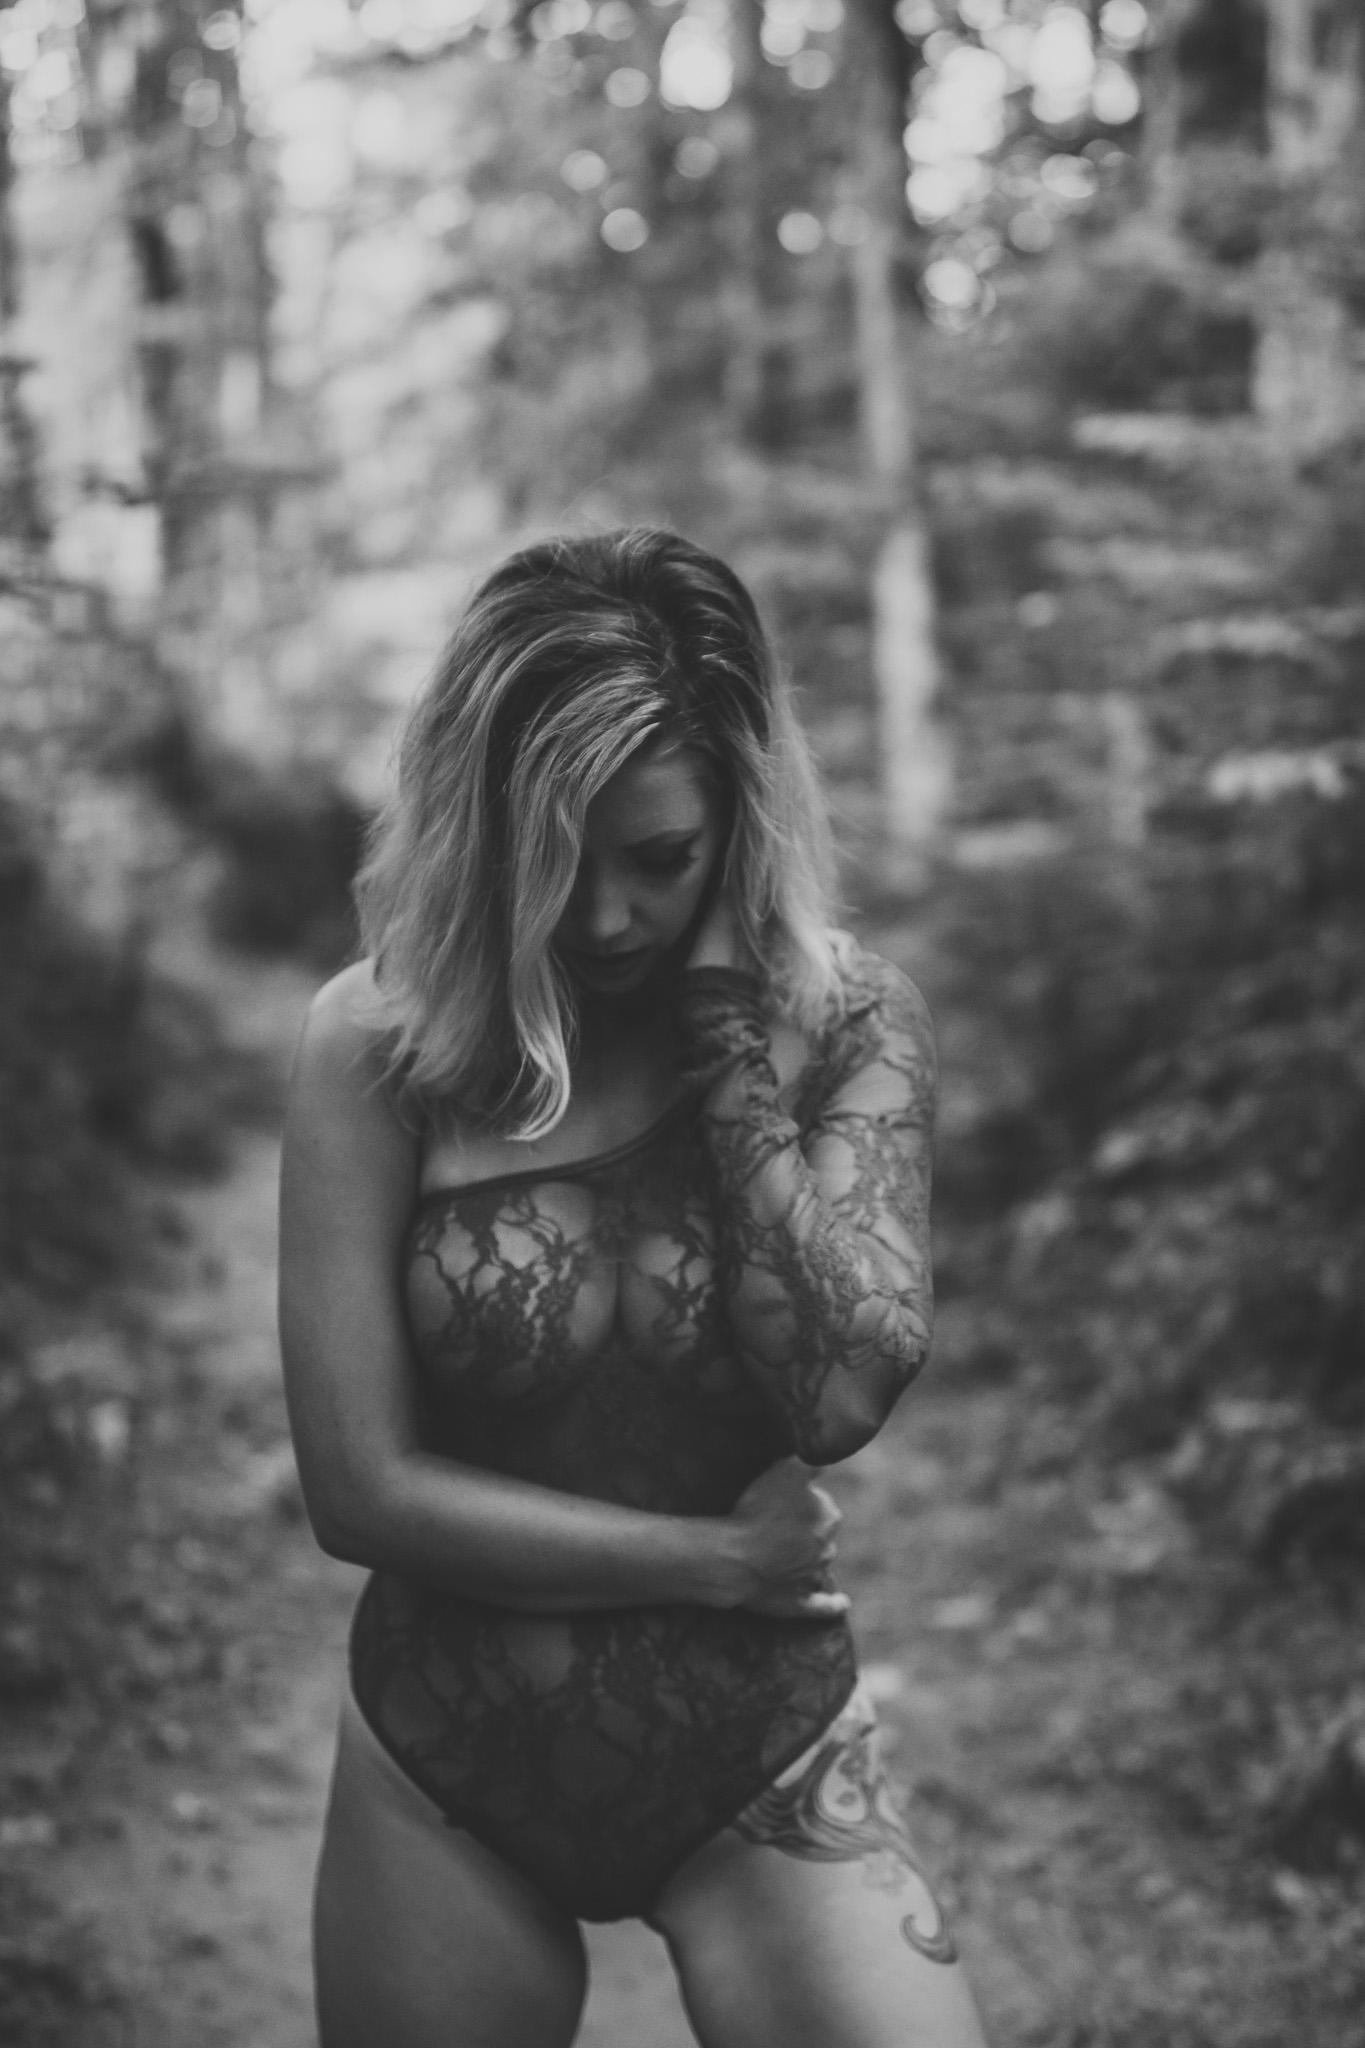 outdoor boudoir girl black and white photo